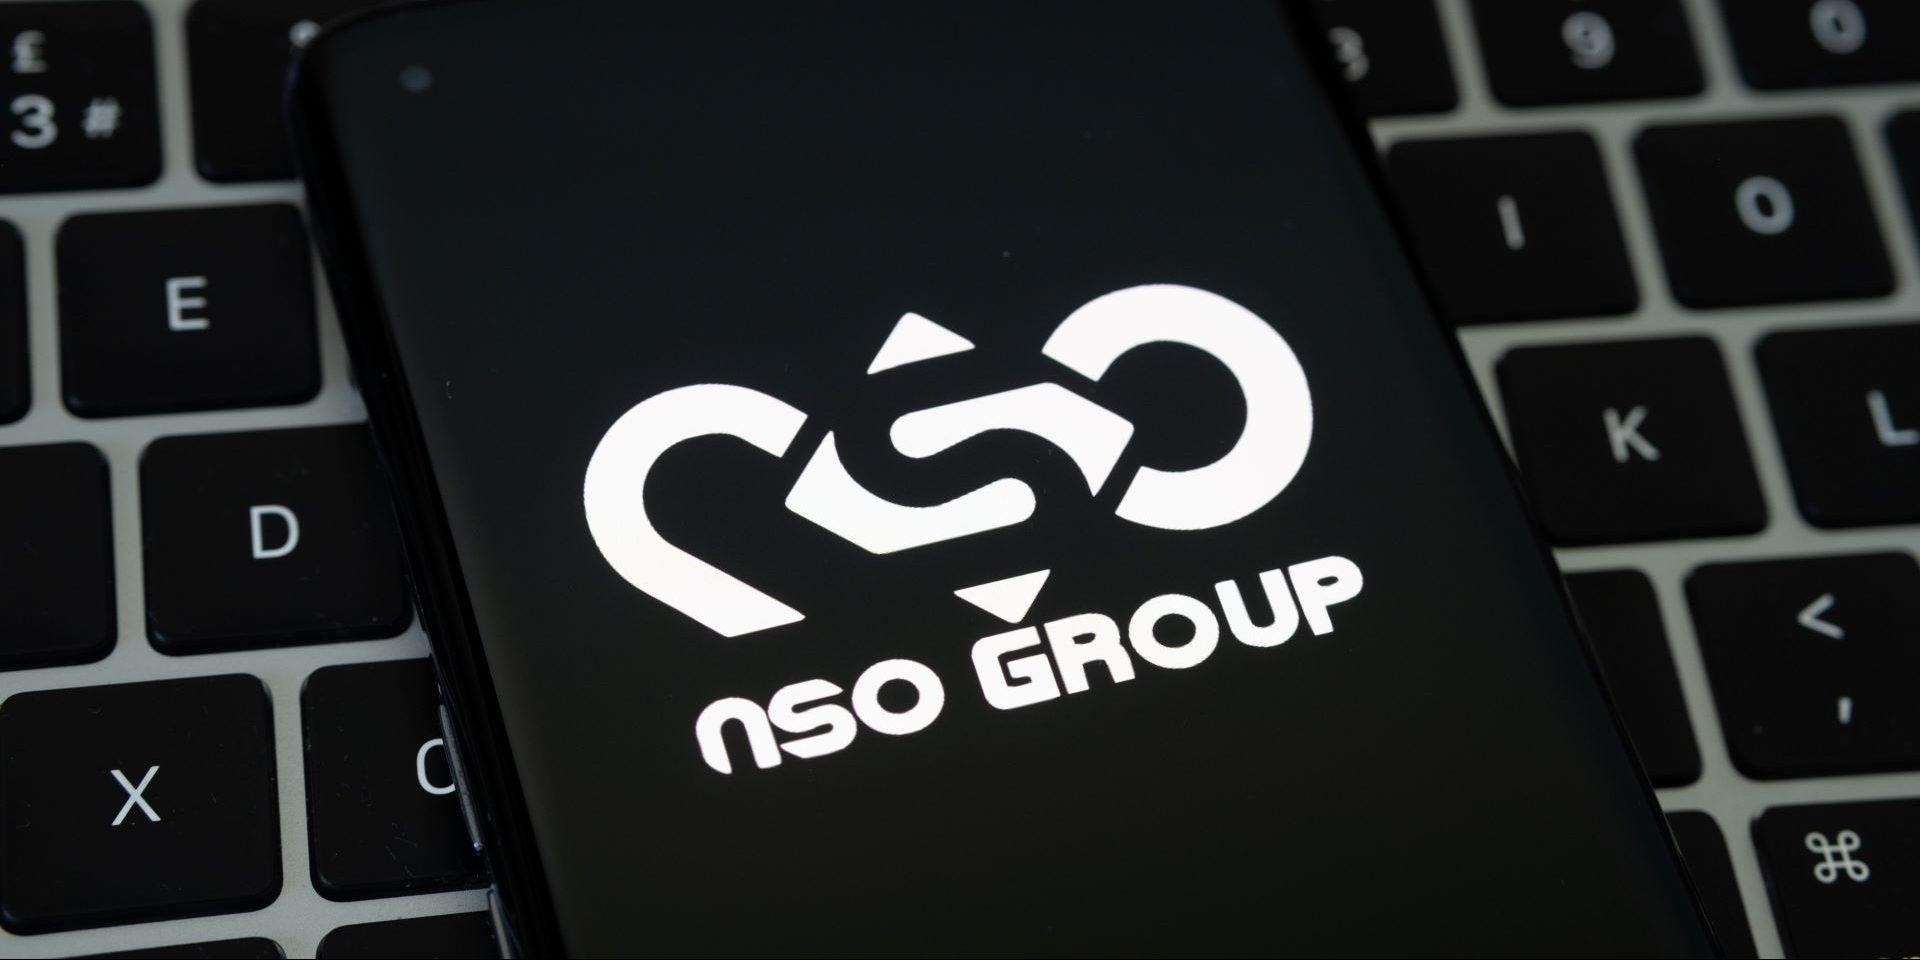 Pegasus Spyware: Βρέθηκε σε κινητά Γάλλων δημοσιογράφων